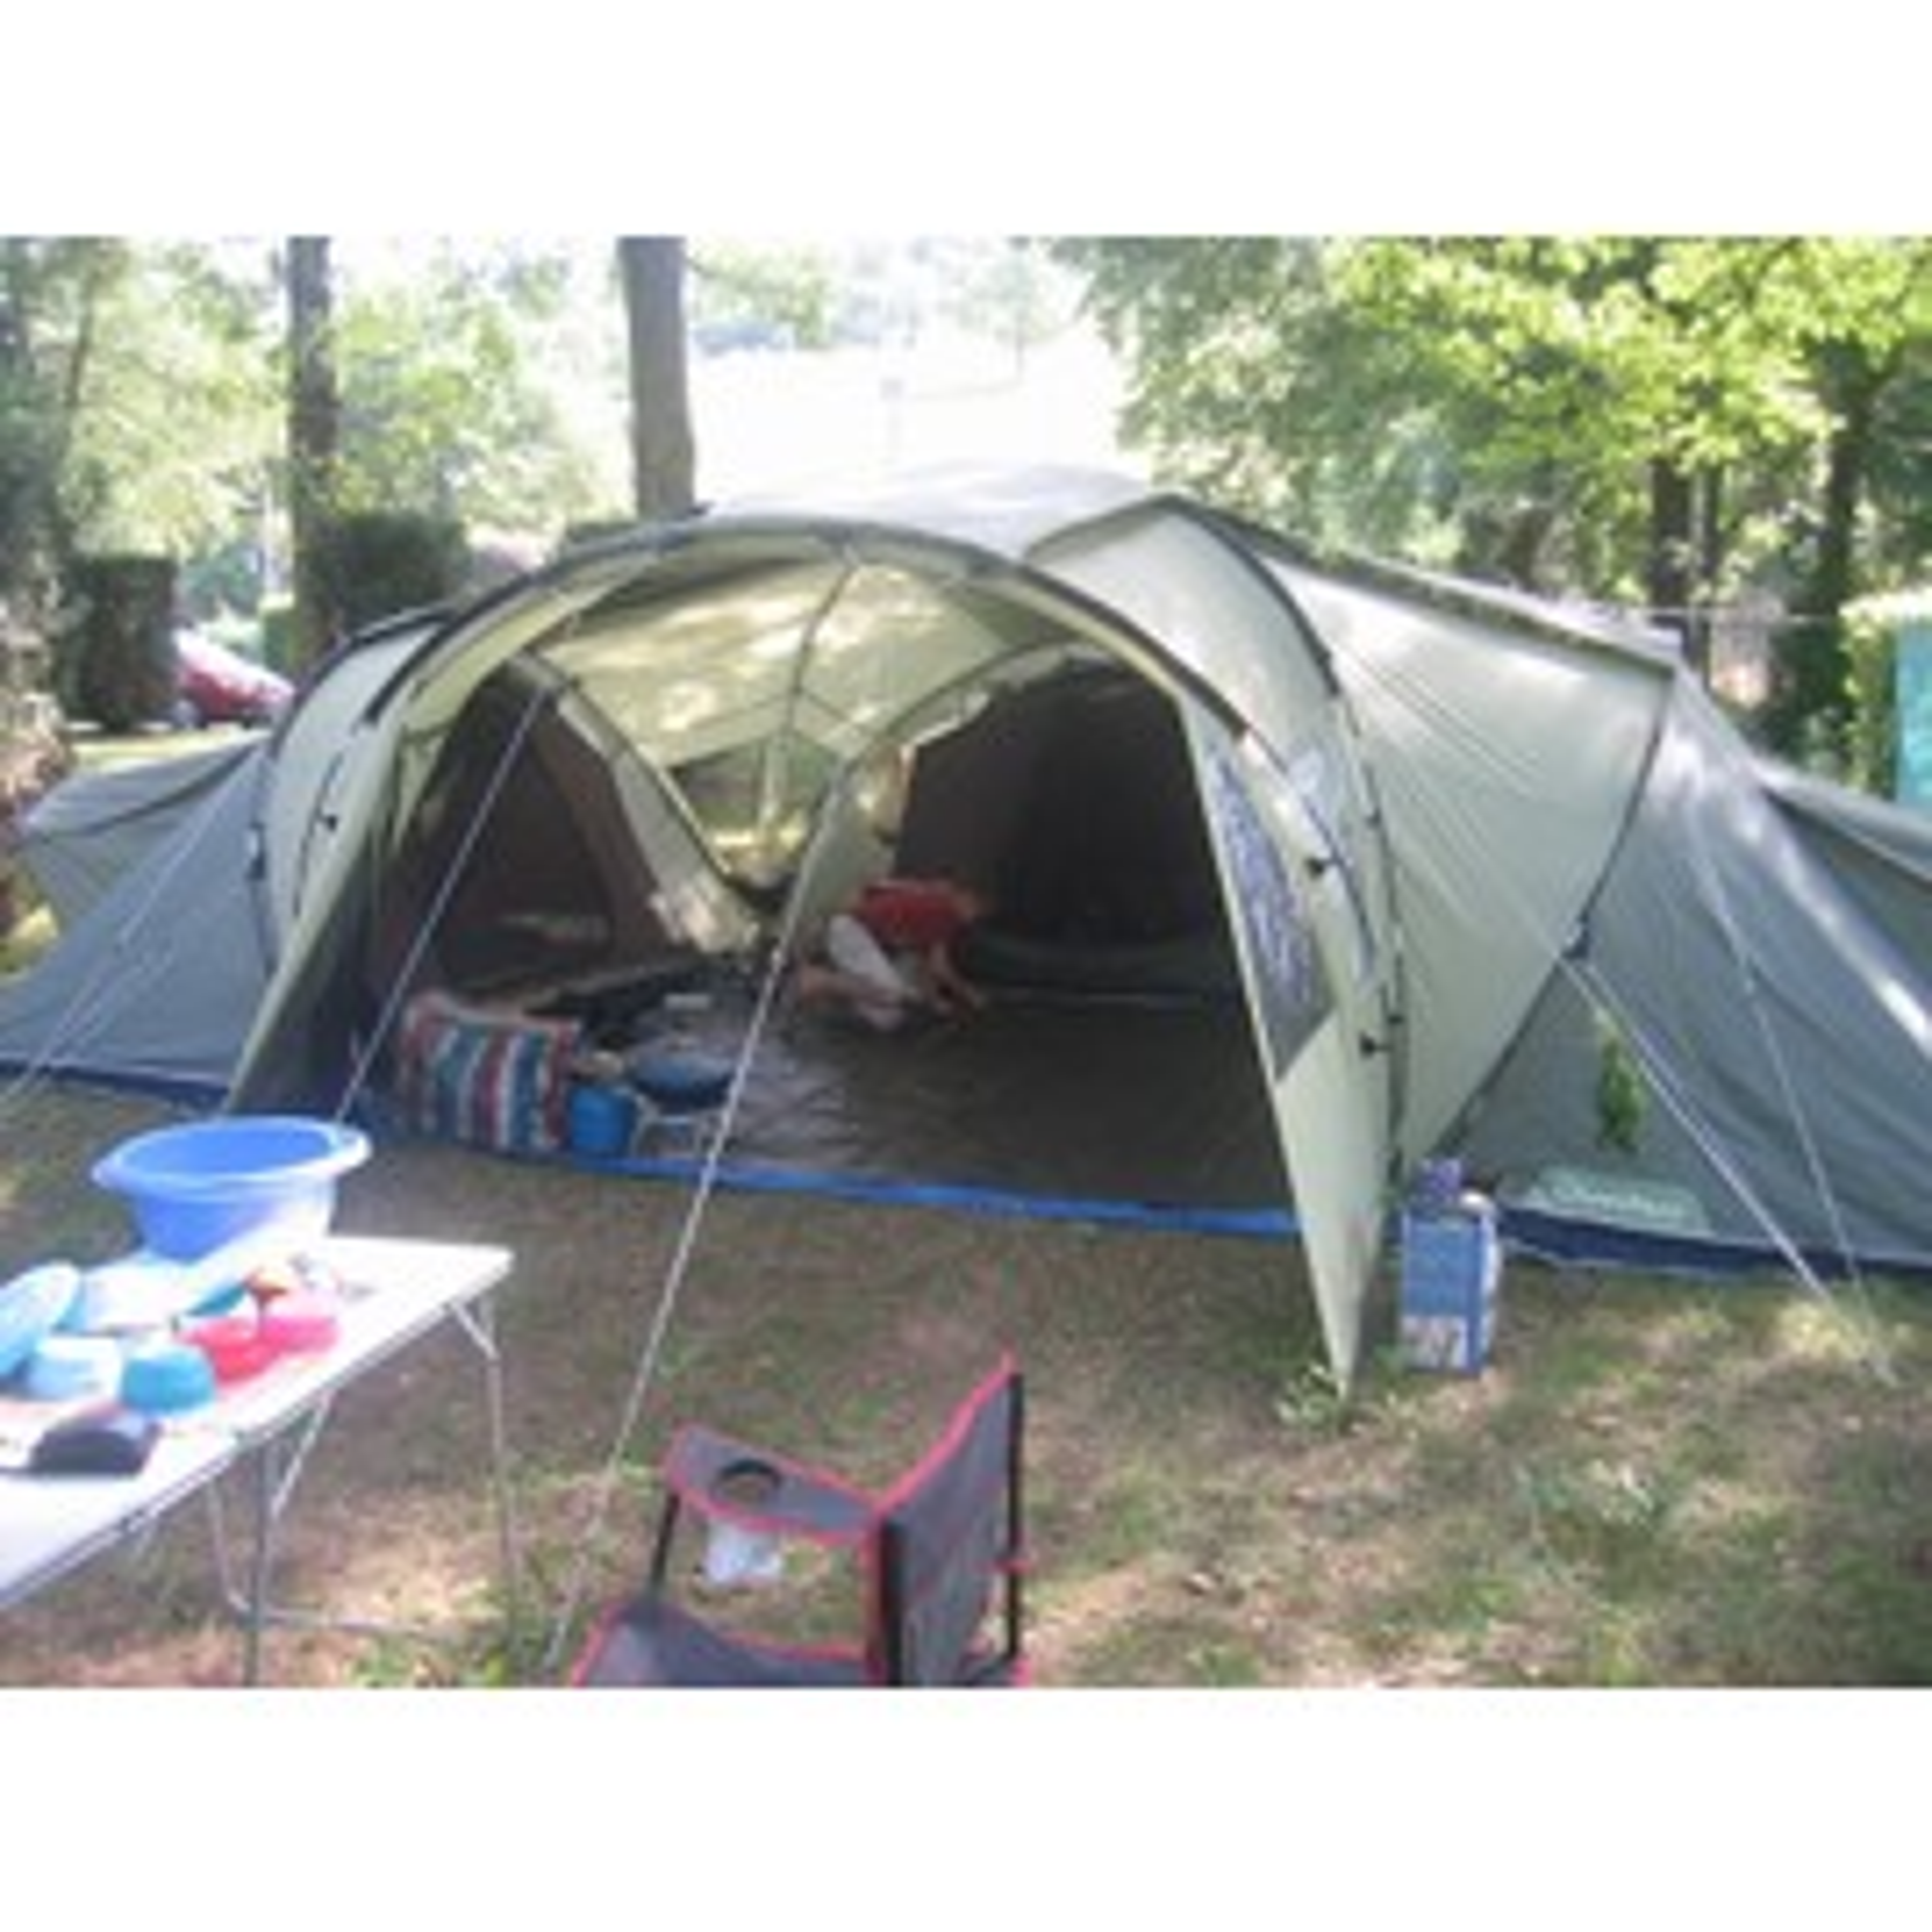 Tente familiale 6 places t 6 3 xl air pas cher priceminister for Tente 6 places 3 chambres